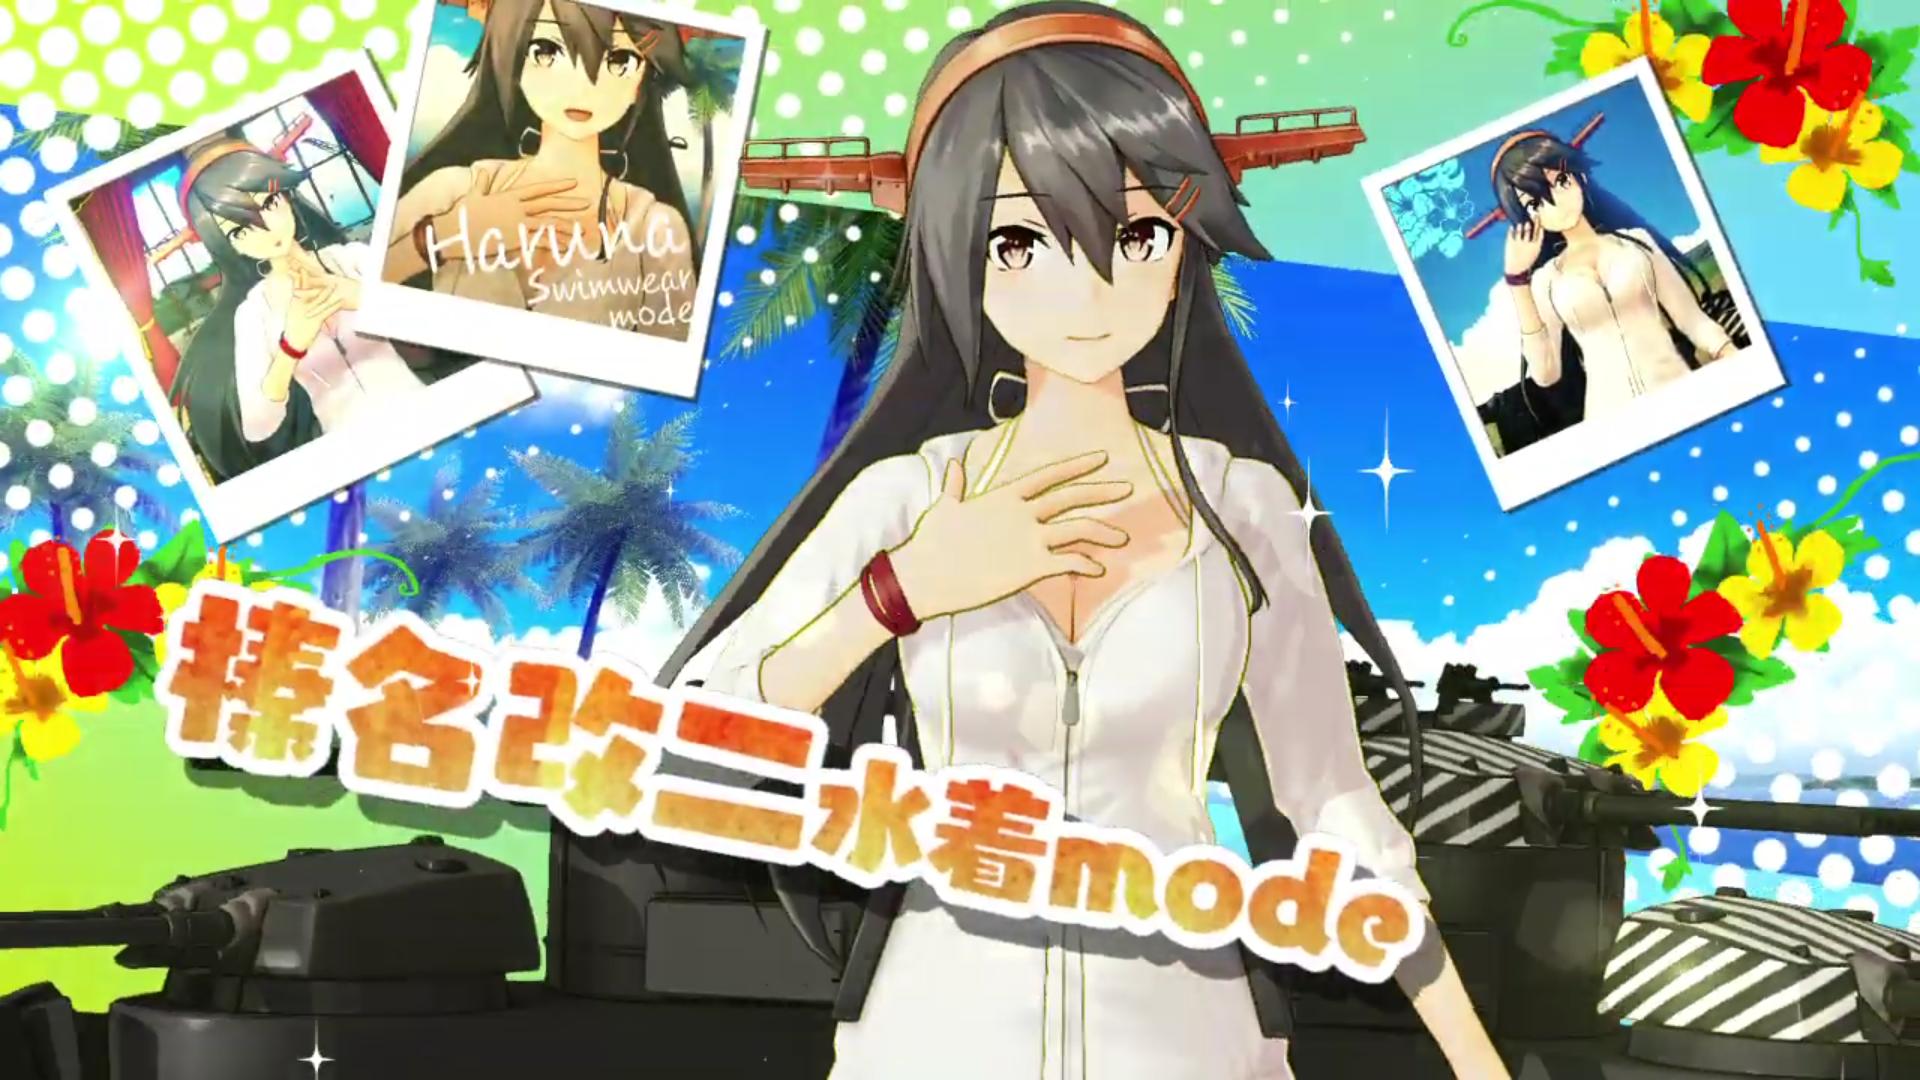 【AC】ズルいぞSEGA! けしからんぞ運営!! -限定カード情報-